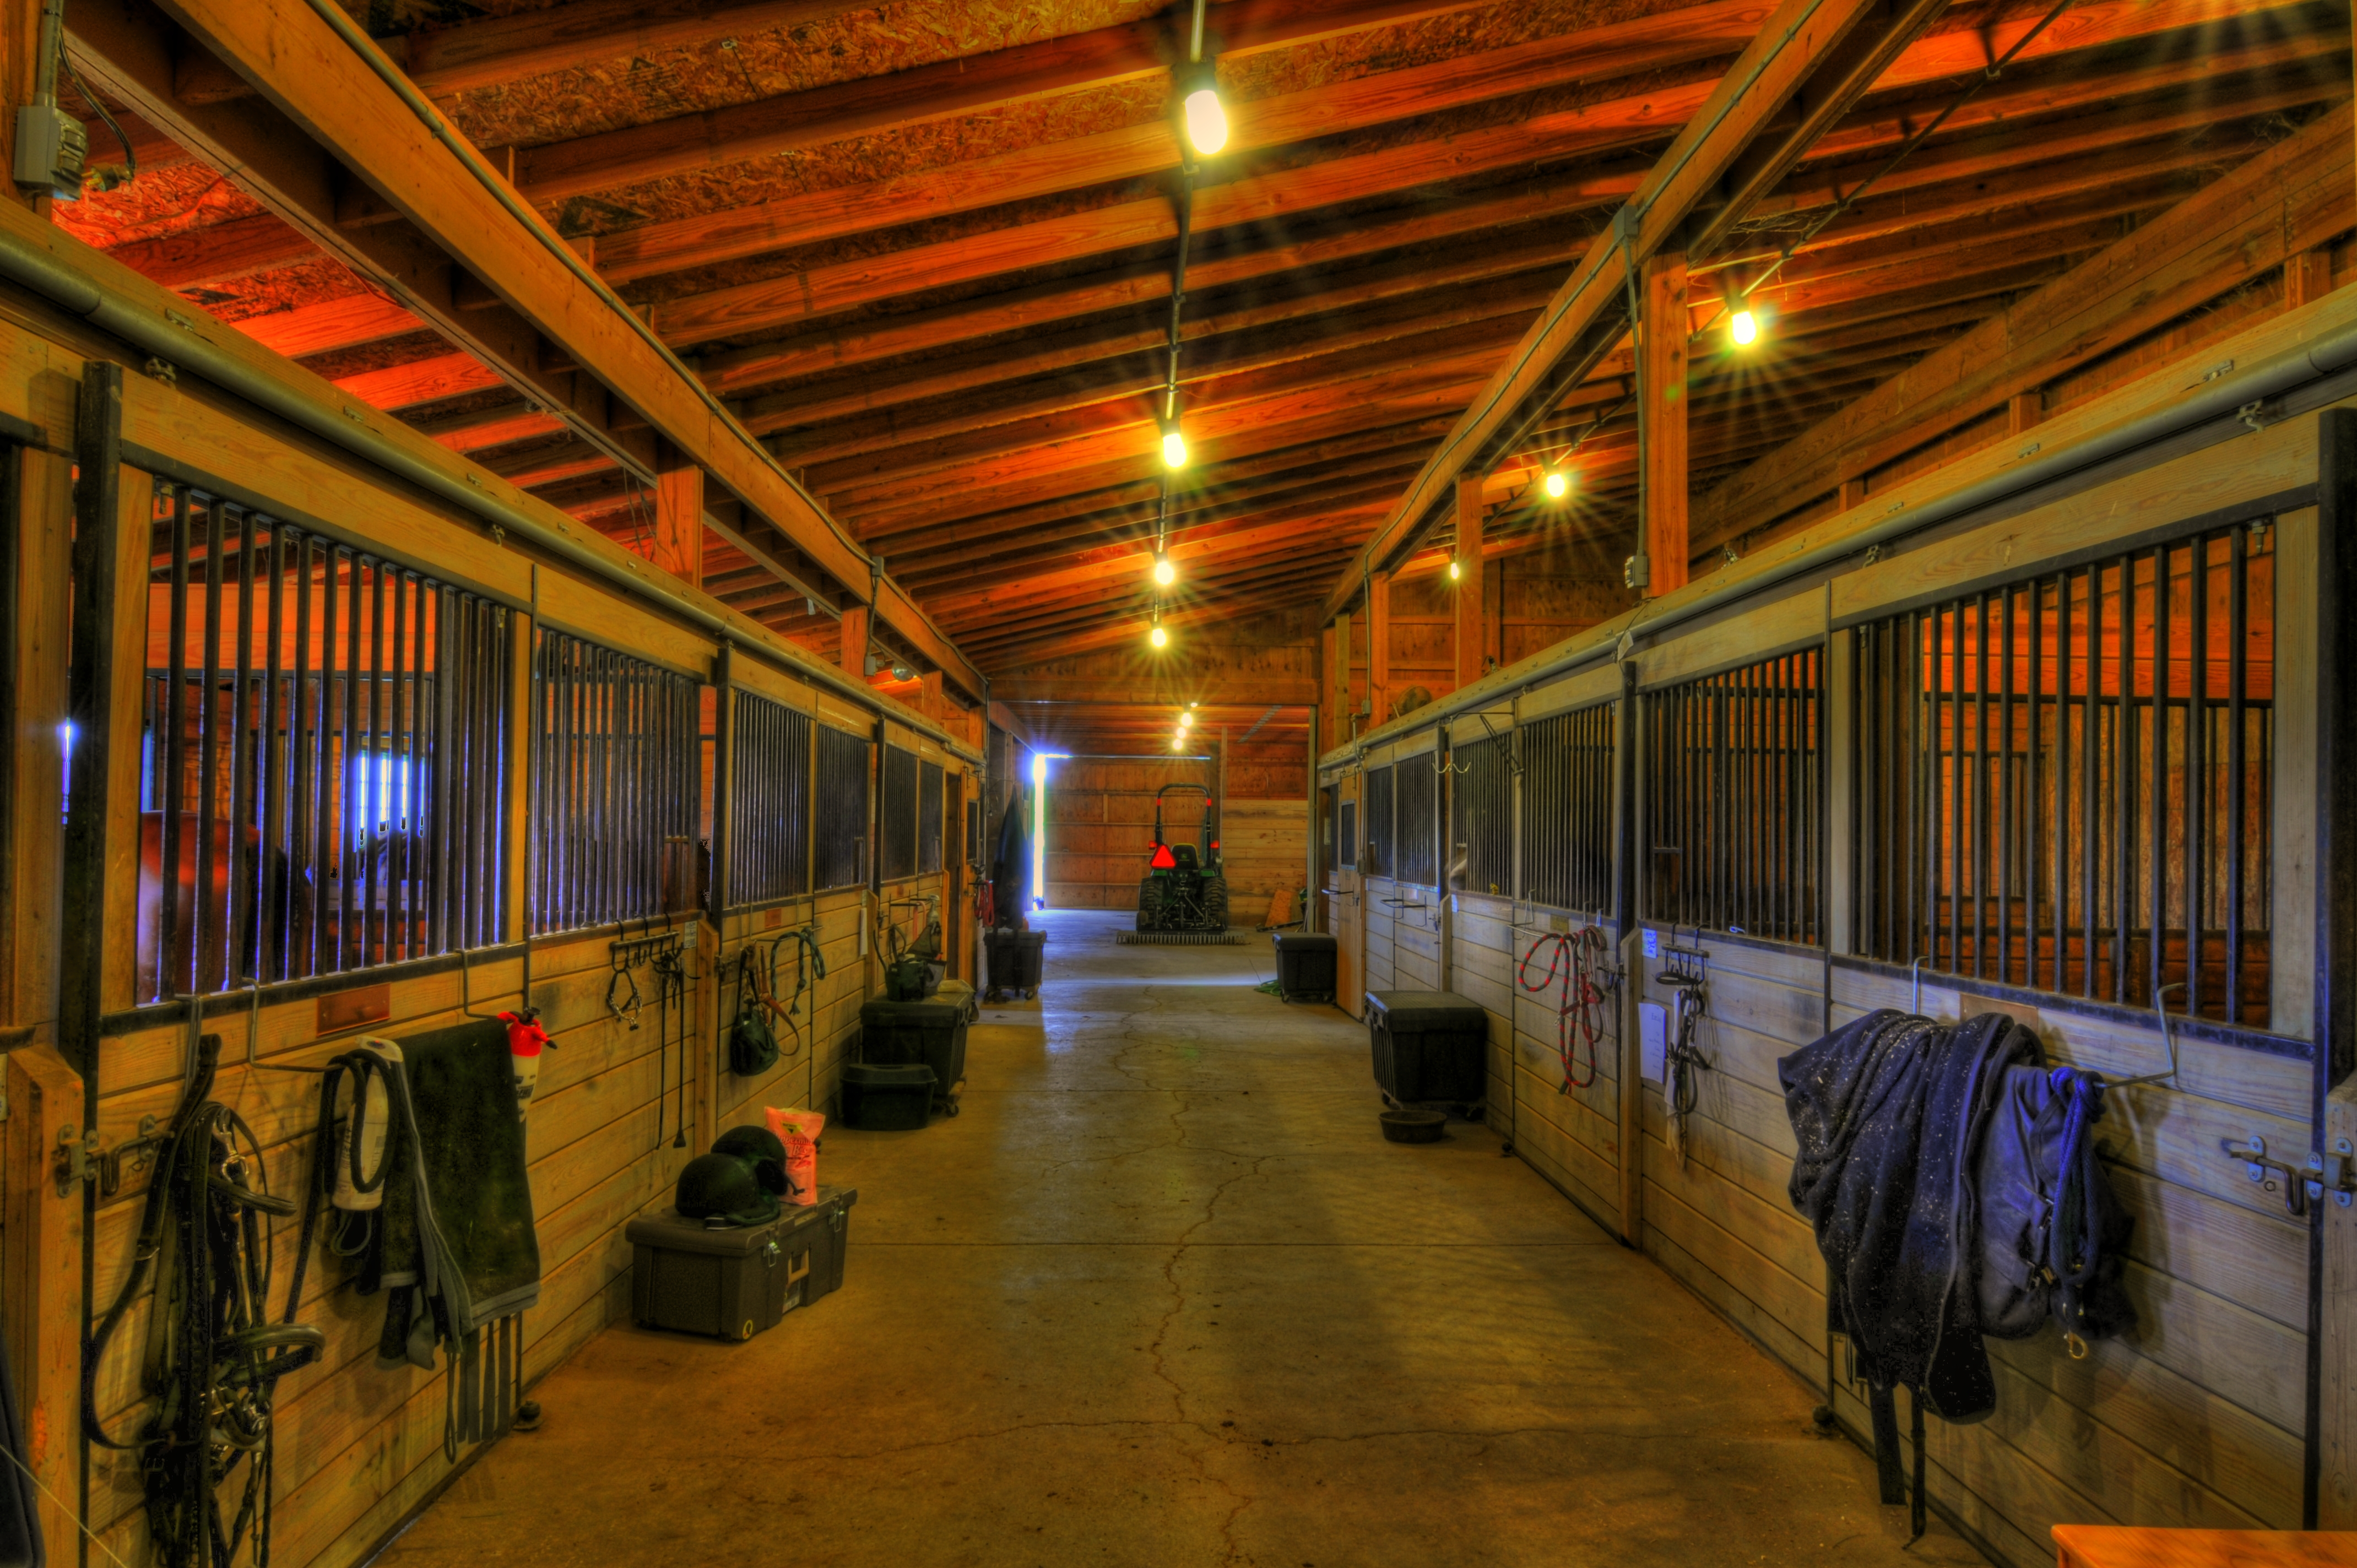 File:Highmark Farm - Inside the barn (4590218495).jpg ...